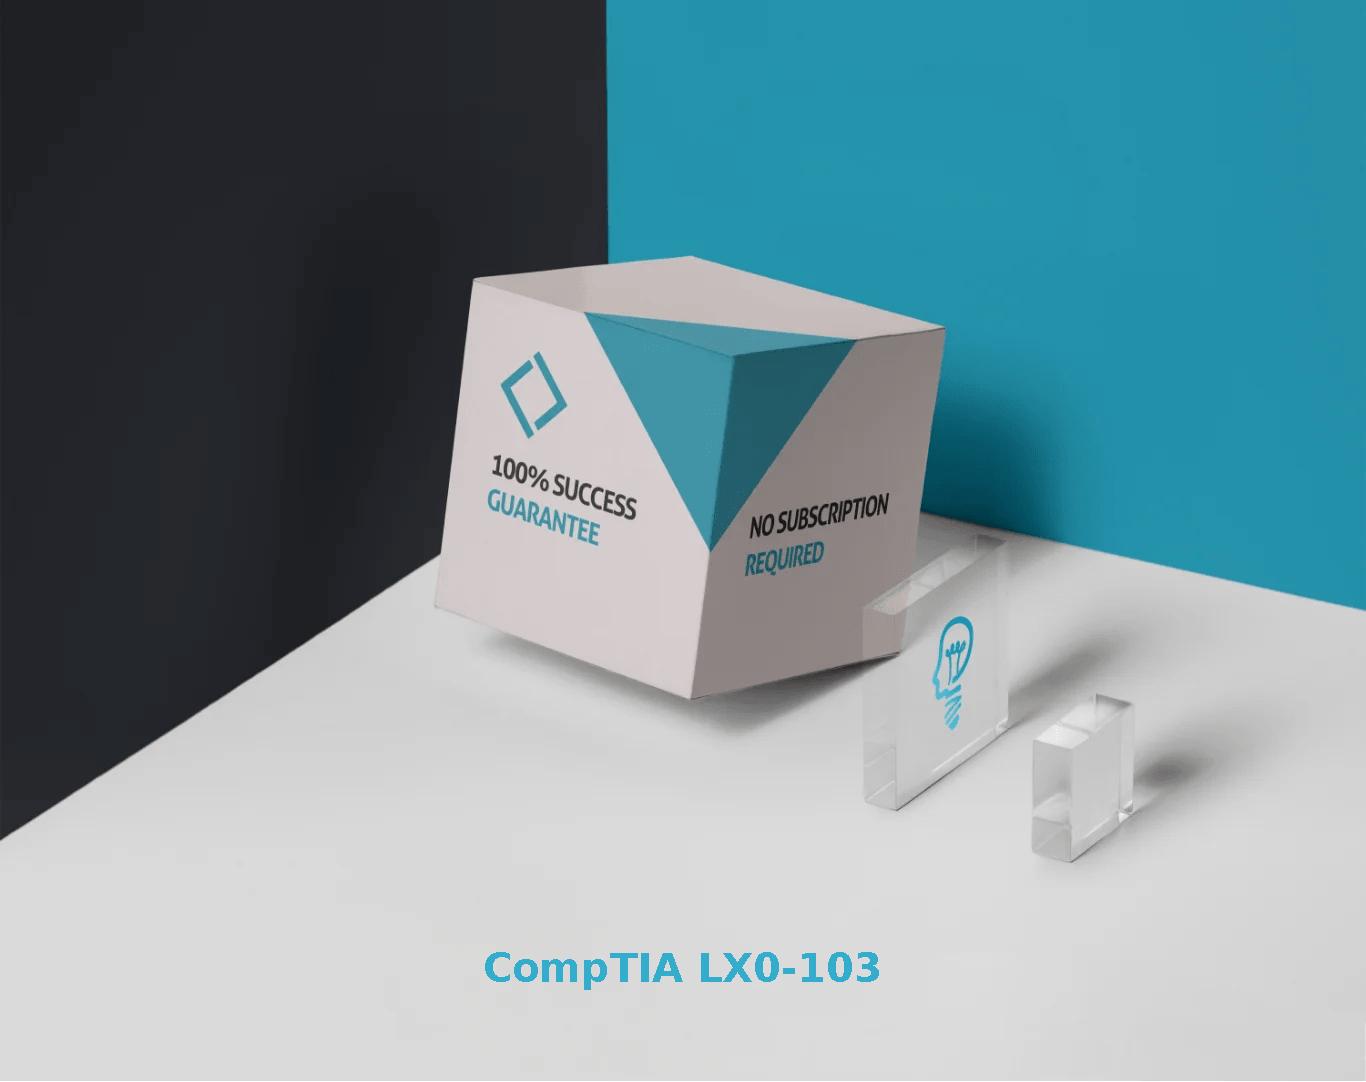 CompTIA LX0-103 Exams